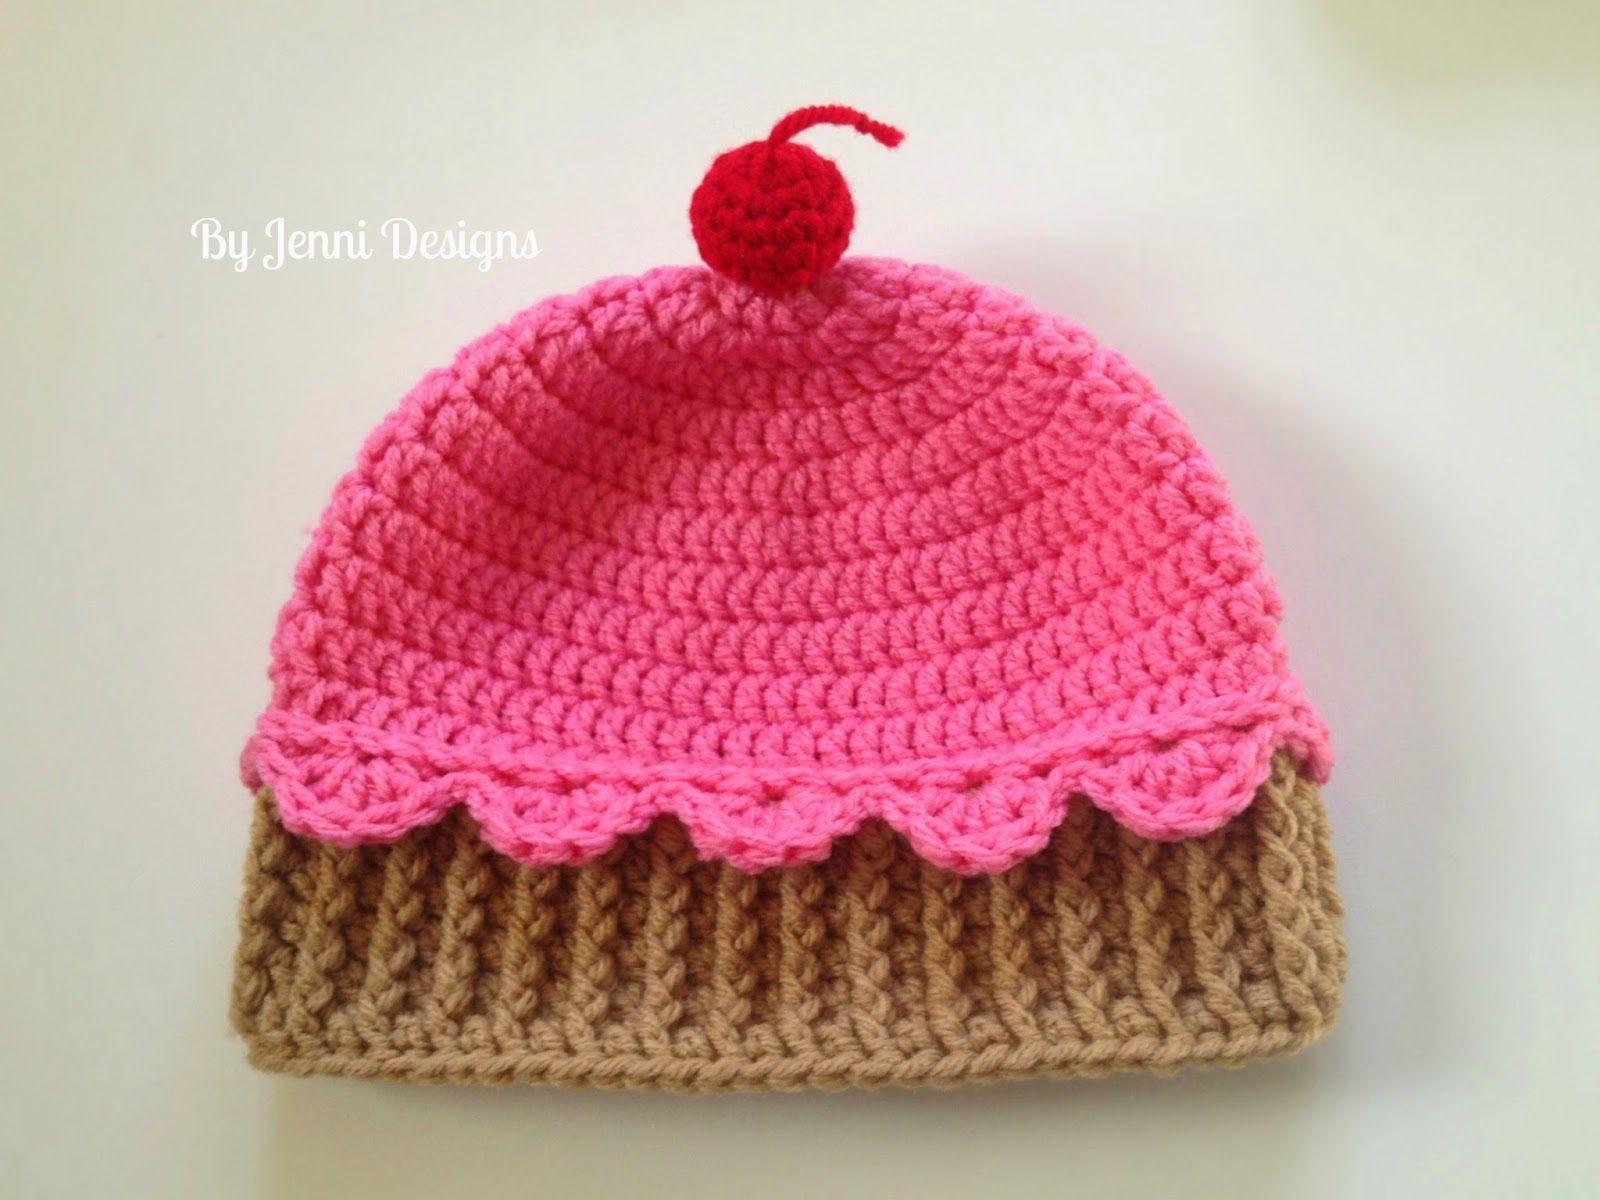 By jenni designs youth size crochet cupcake hat free pattern by jenni designs youth size crochet cupcake hat free pattern more bankloansurffo Images